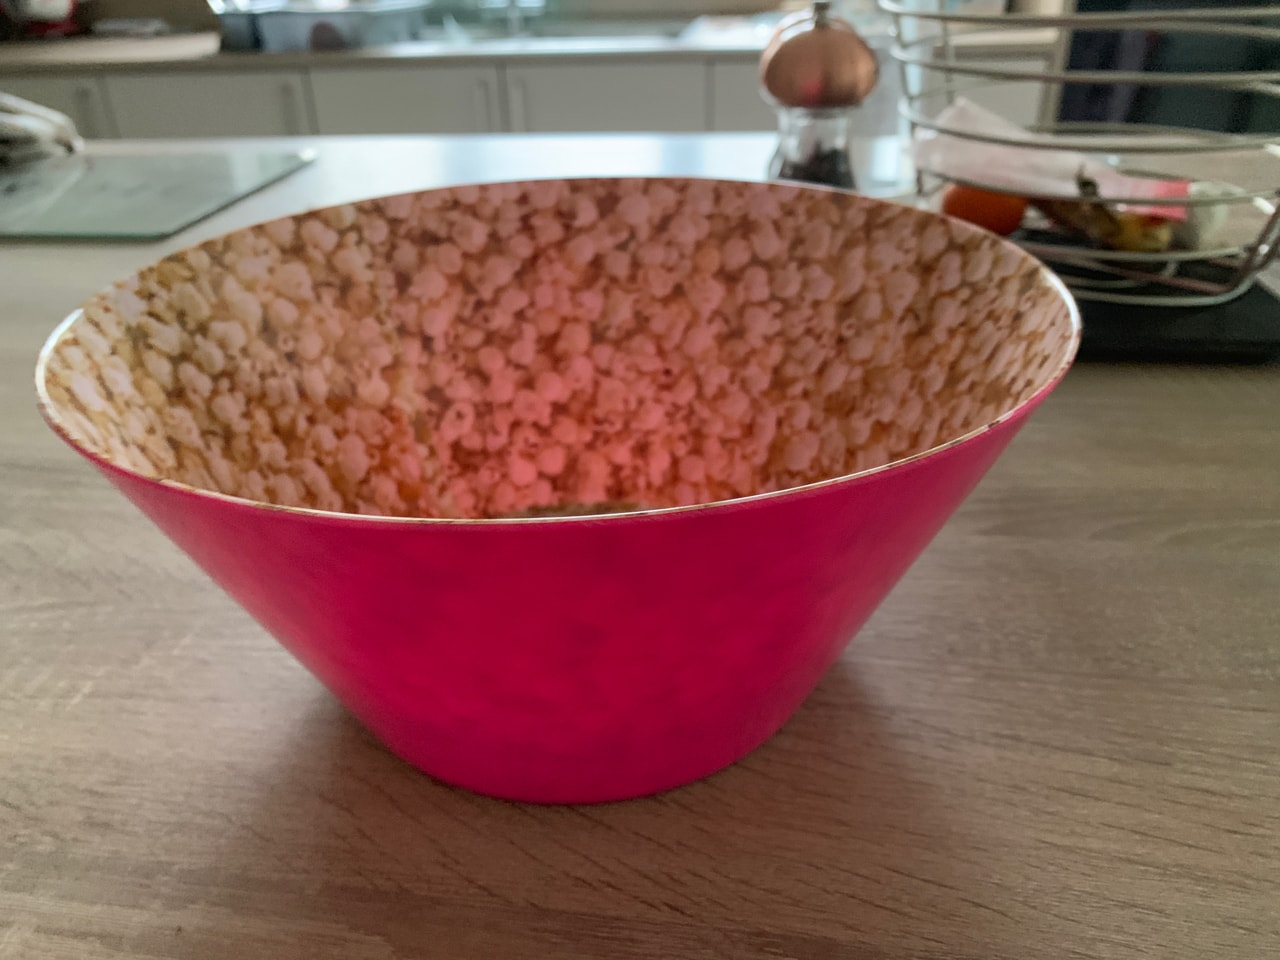 Large pink bowl with popcorn decor inside